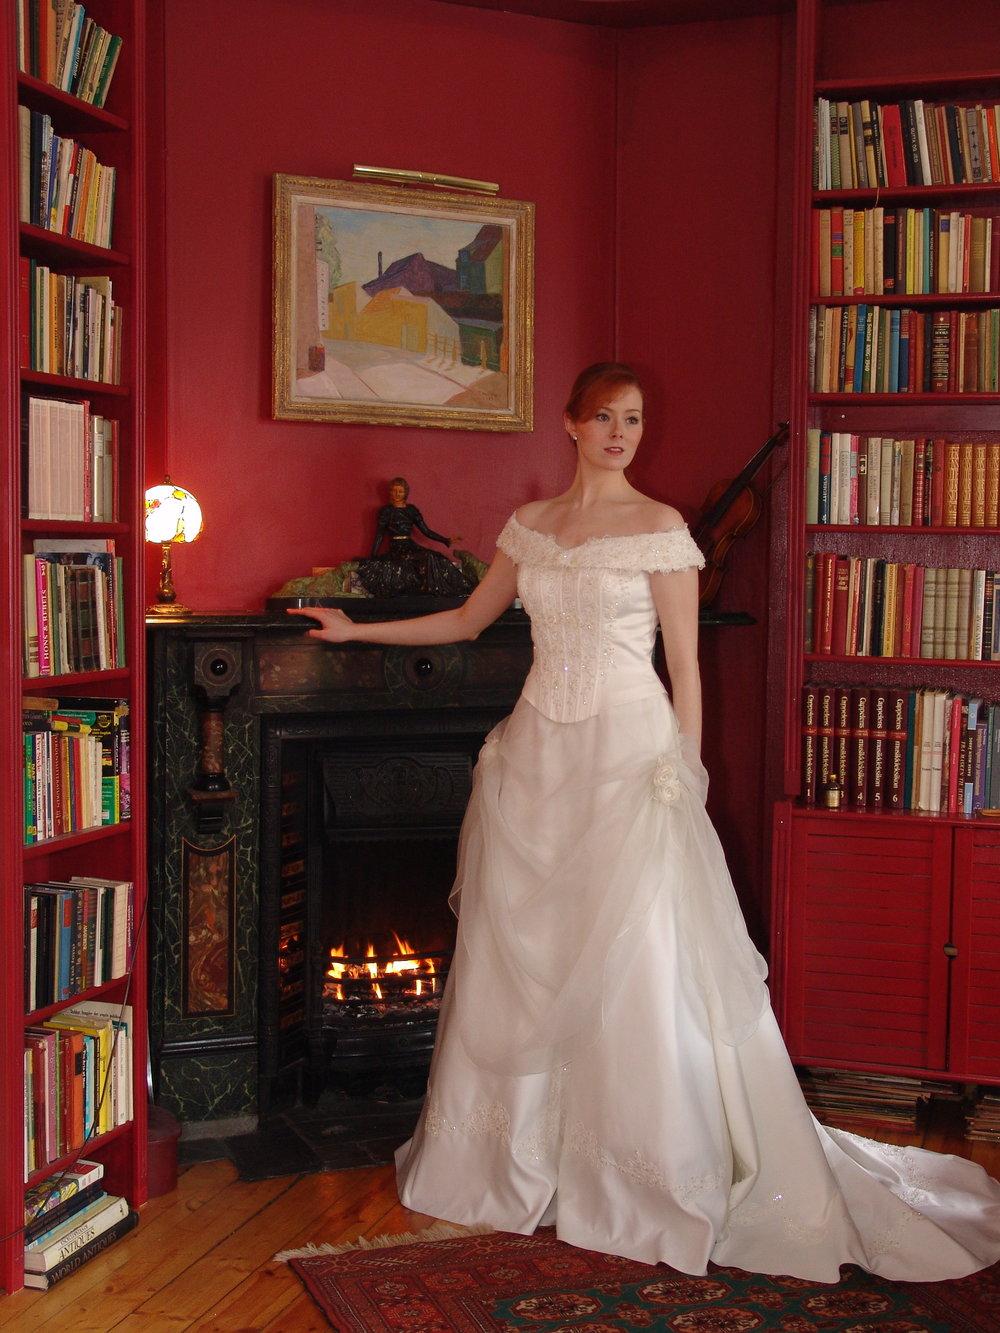 brudekjole-helfigur.jpg